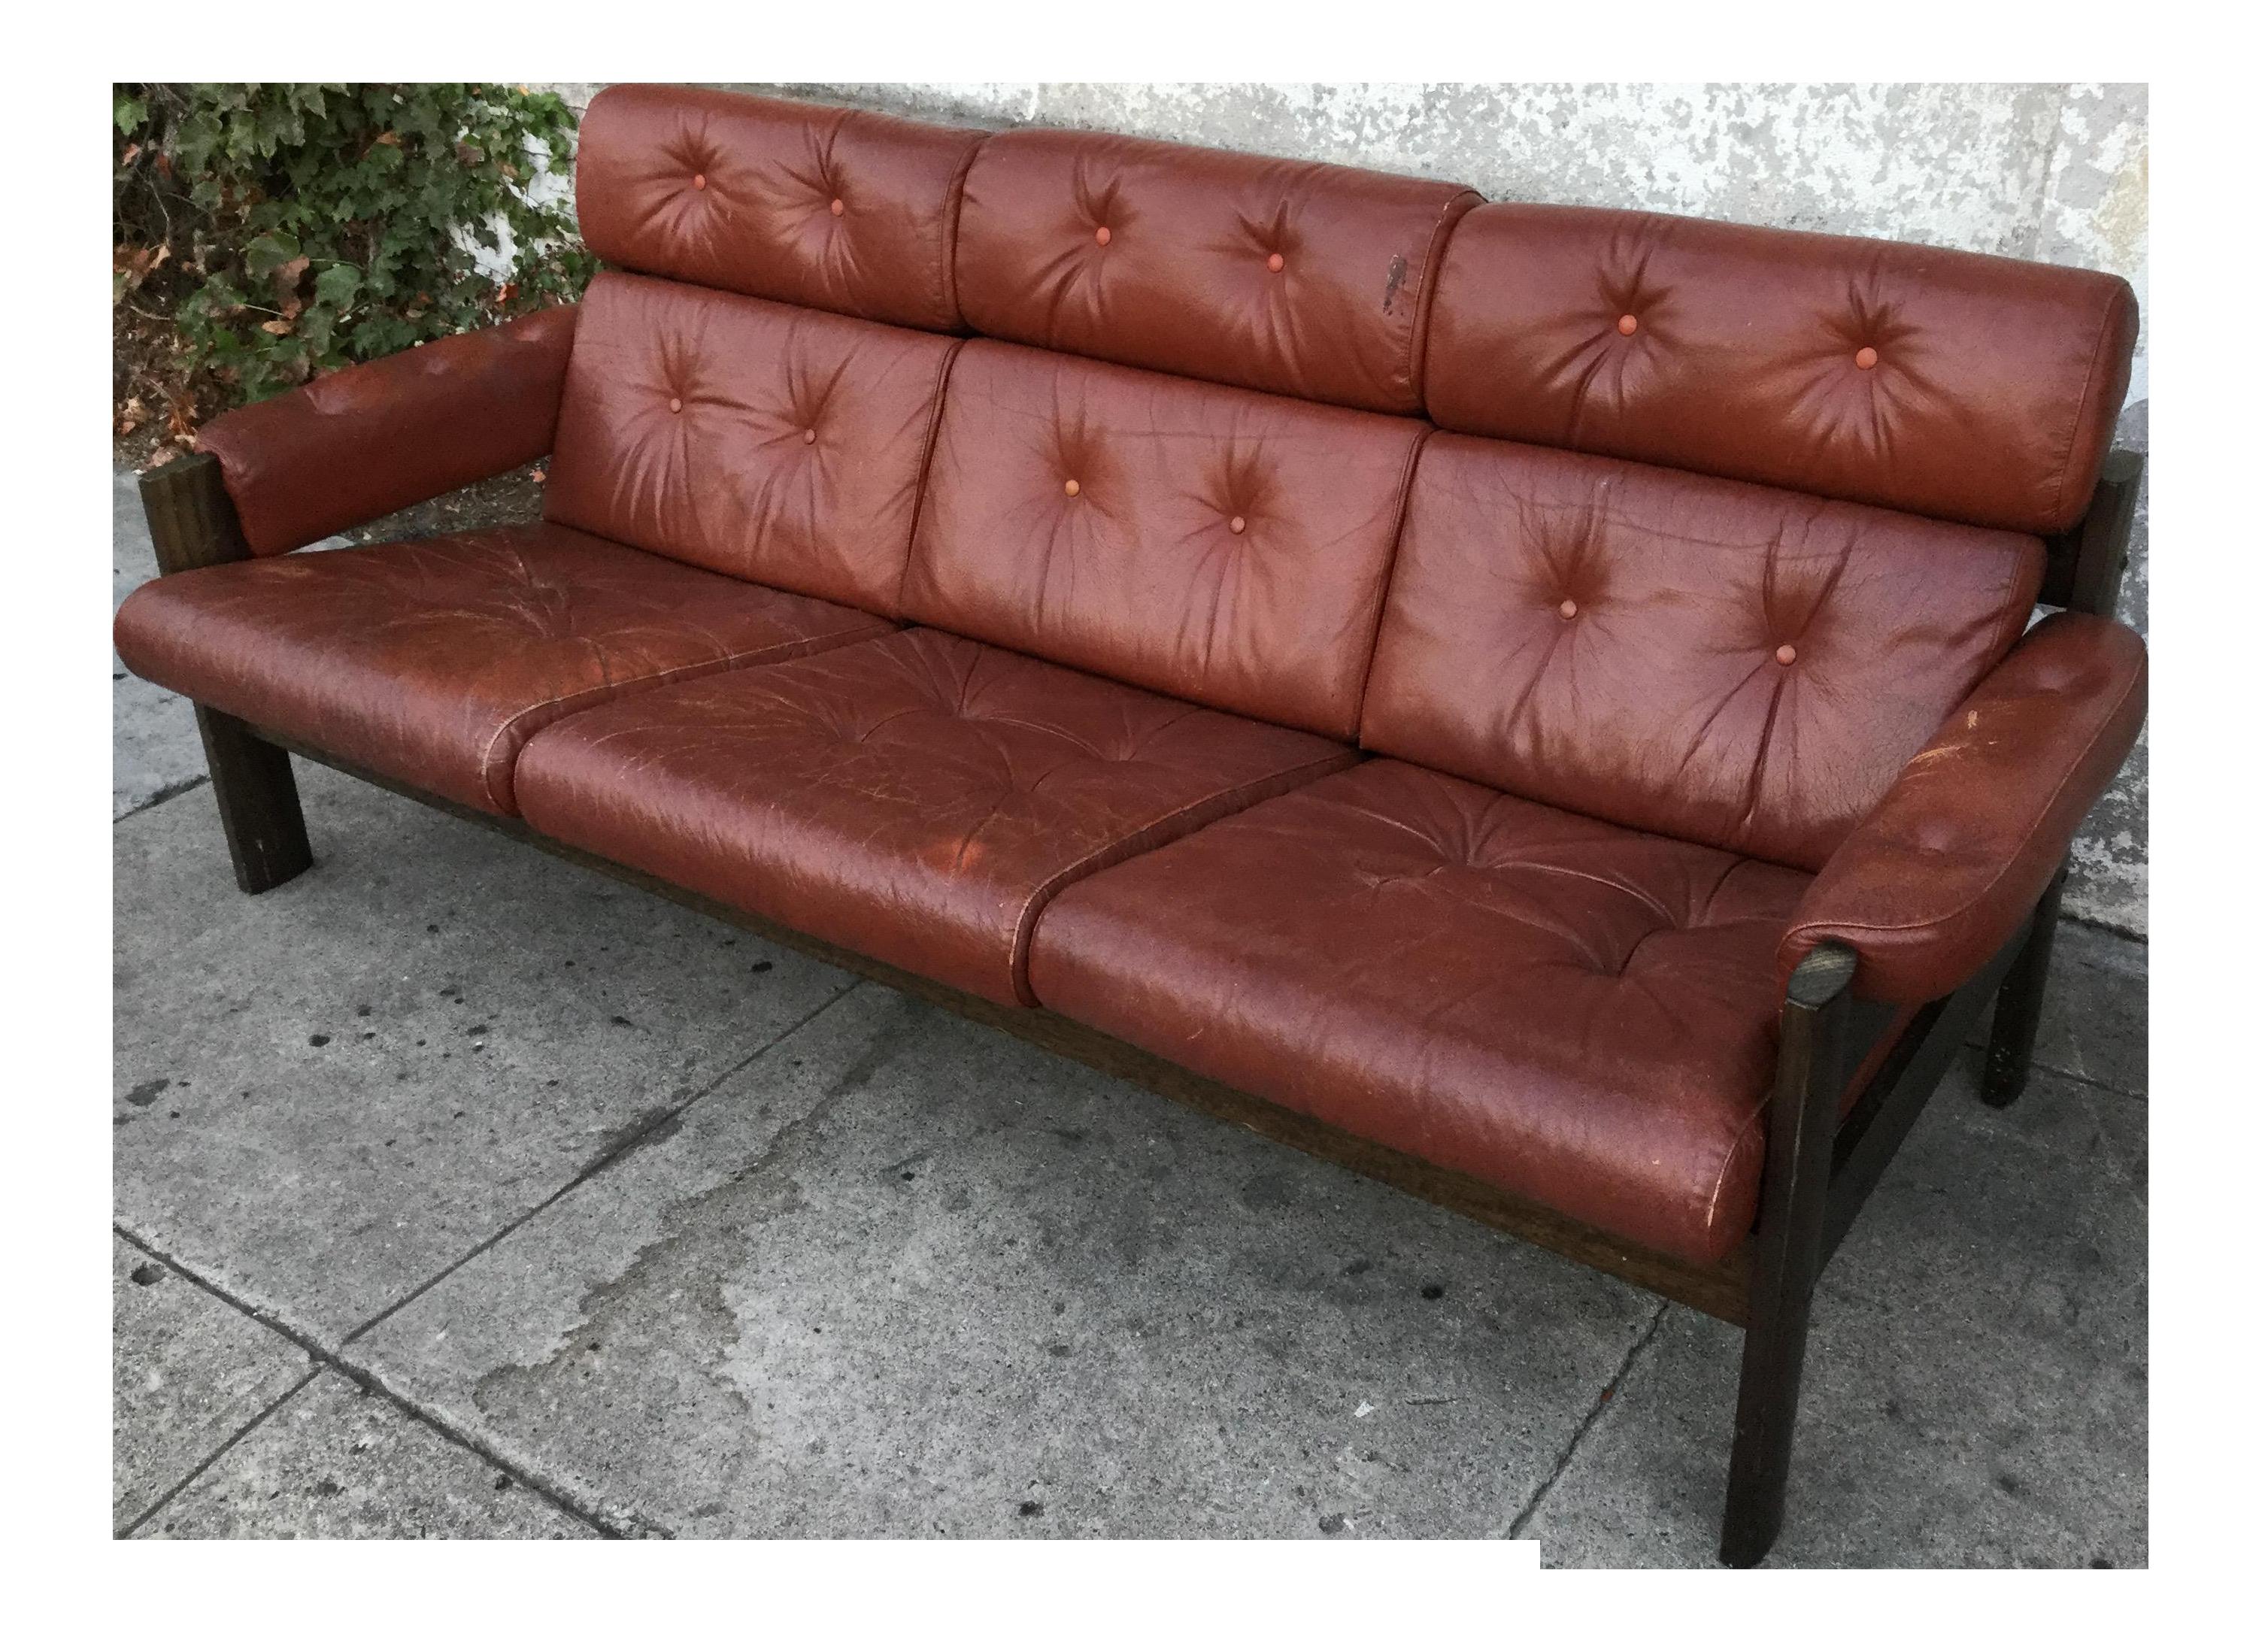 Vintage Leather Percival Lafer Brazilian Sofa